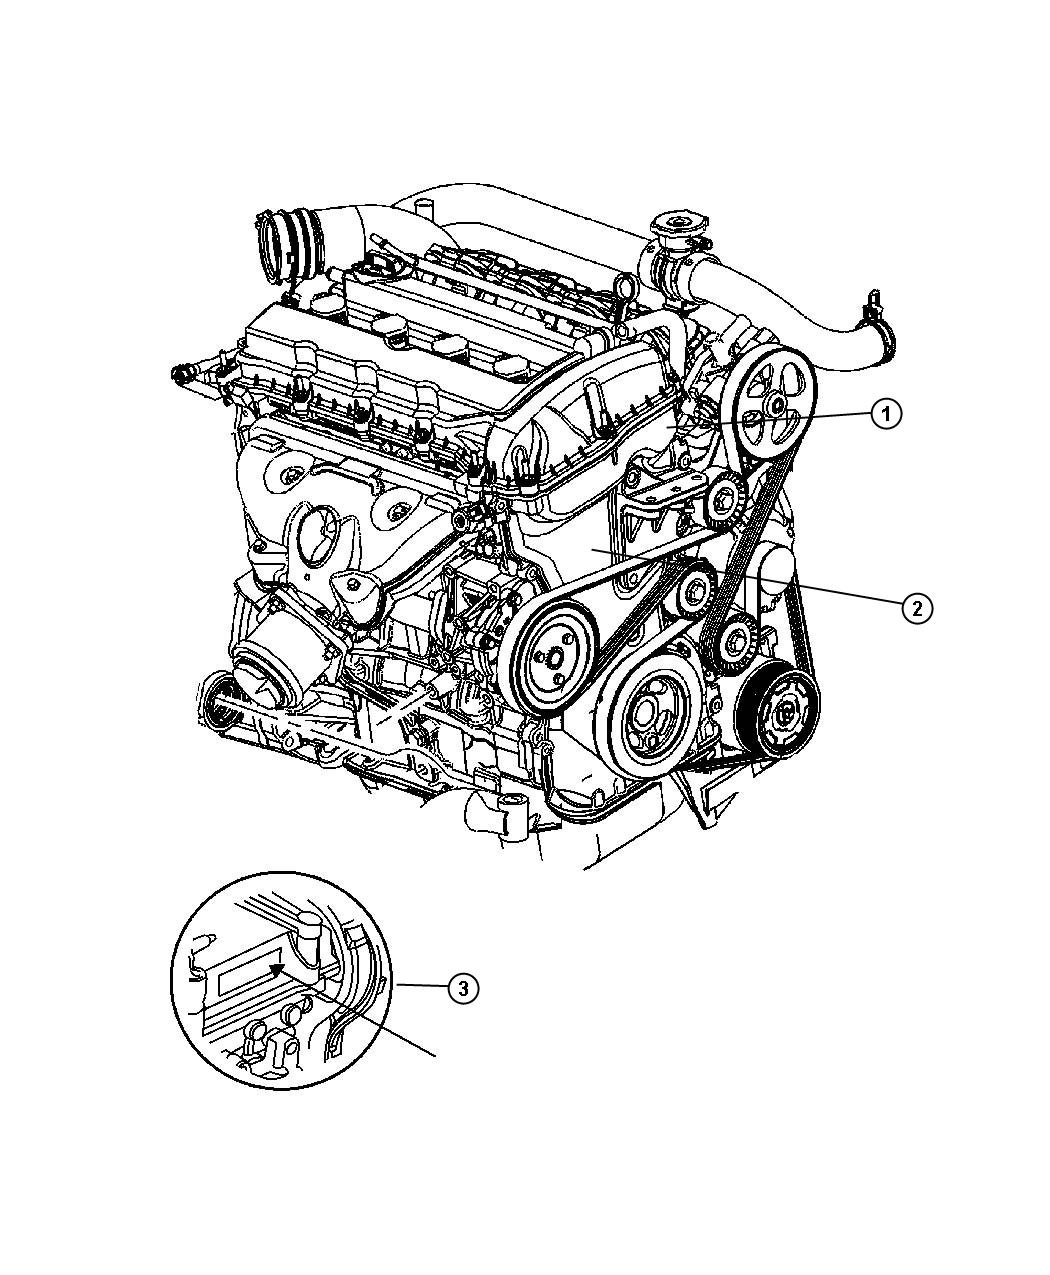 Dodge Caliber Engine Long Block Remanufactured